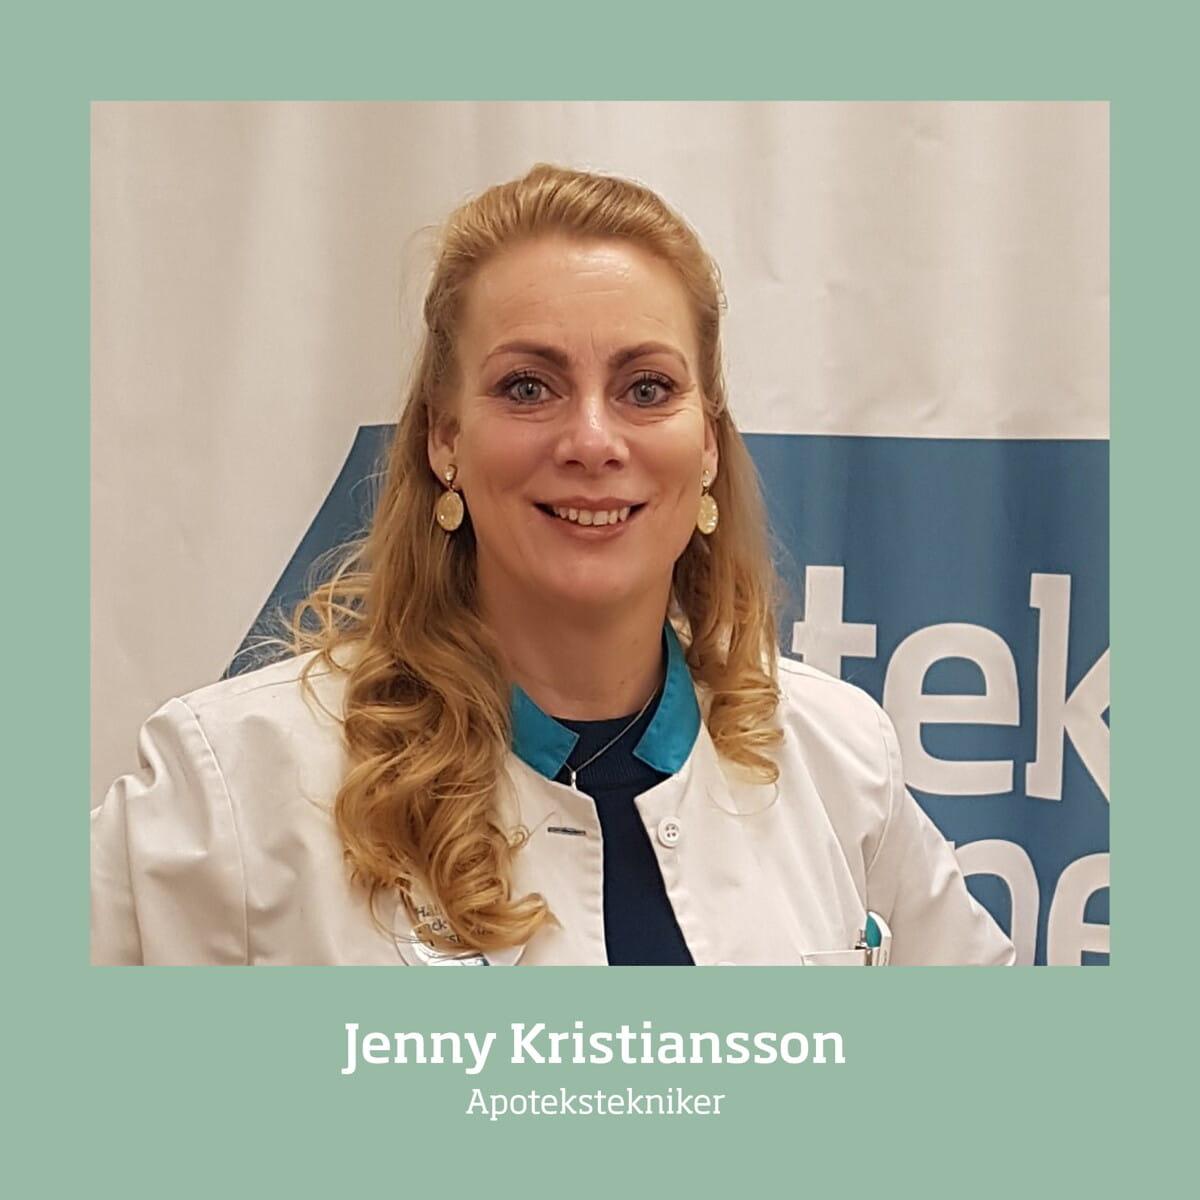 Jenny kristiansson.jpg